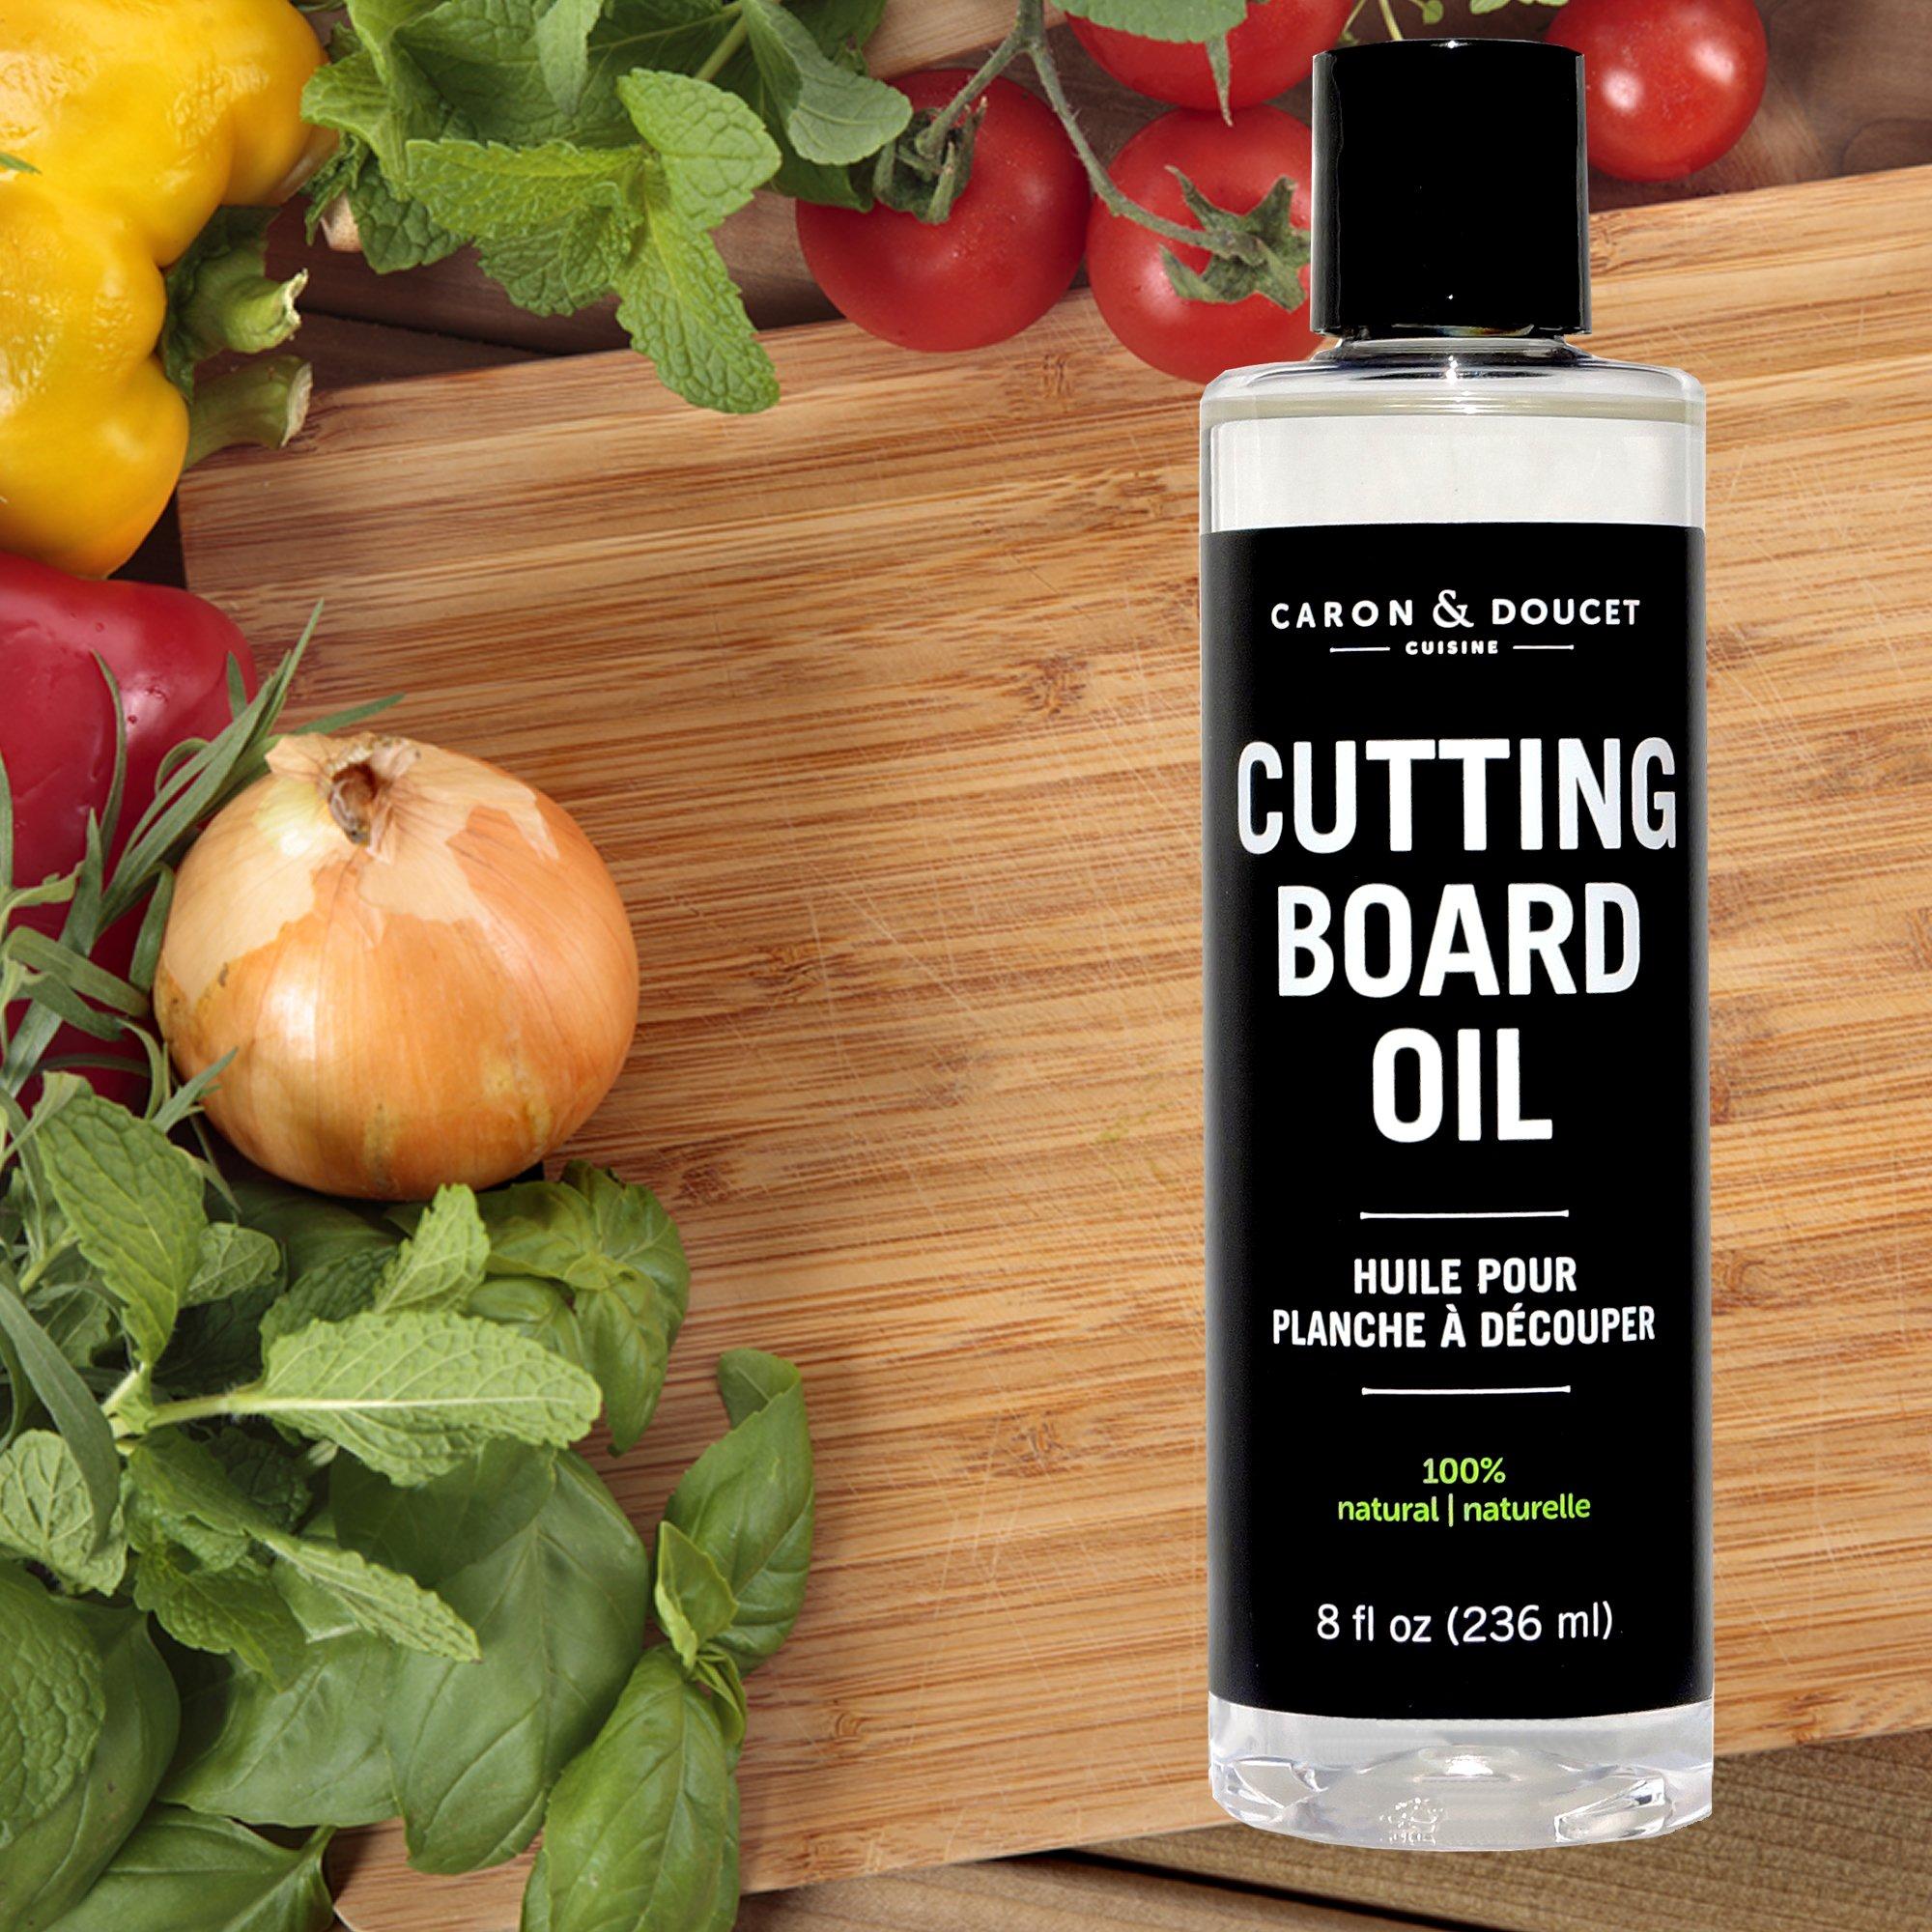 Caron & Doucet - Cutting Board & Butcher Block Bundle: 2 items - 1 Cutting Board & Butcher Block Oil, 1 Cutting Board & Butcher Block Wax. 100% Plant Based (8oz Bullet) by Caron Doucet Cuisine (Image #2)